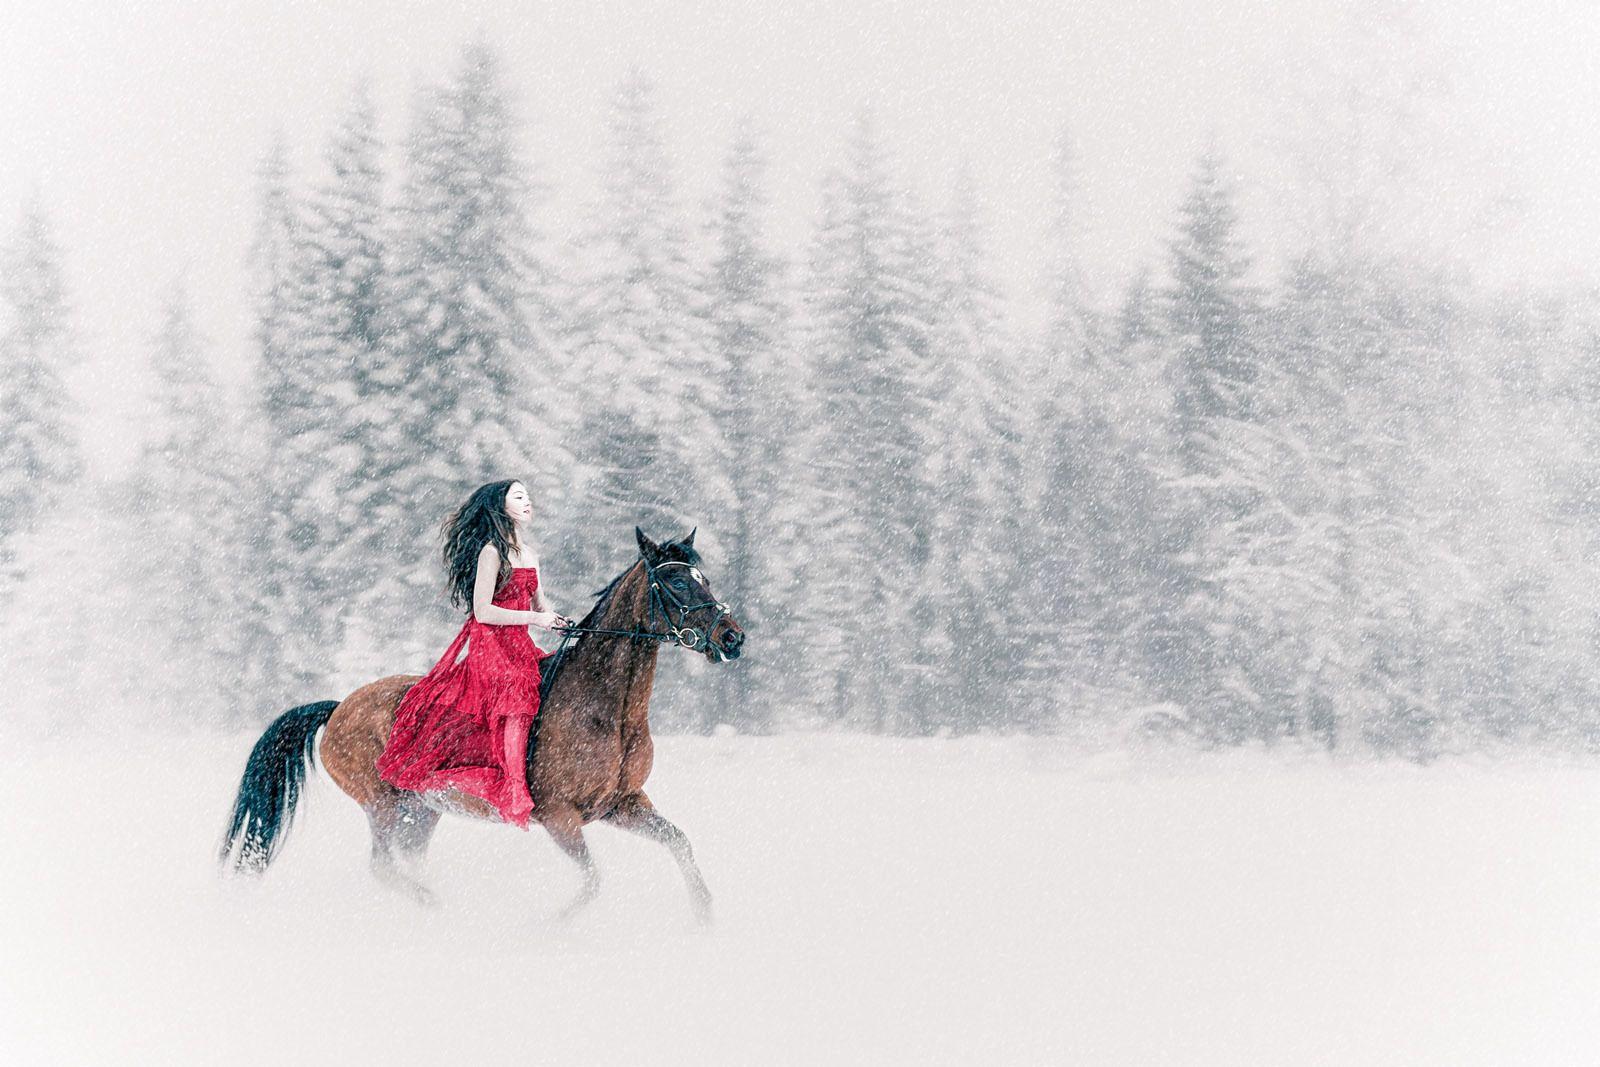 Conceptual photographer – Snow White - Follow me on: www.anhede.se • www.instagram.com/anhede • www.facebook.com/photographeranhede • https://plus.google.com/+JesperAnhede - #snowwhite #snow #rider #horse #winter #fairytale #snövit #snö #ryttare #häst #vinter #saga #grimm #anhede #konceptuellfotograf #conceptualphotographer #concept #koncept